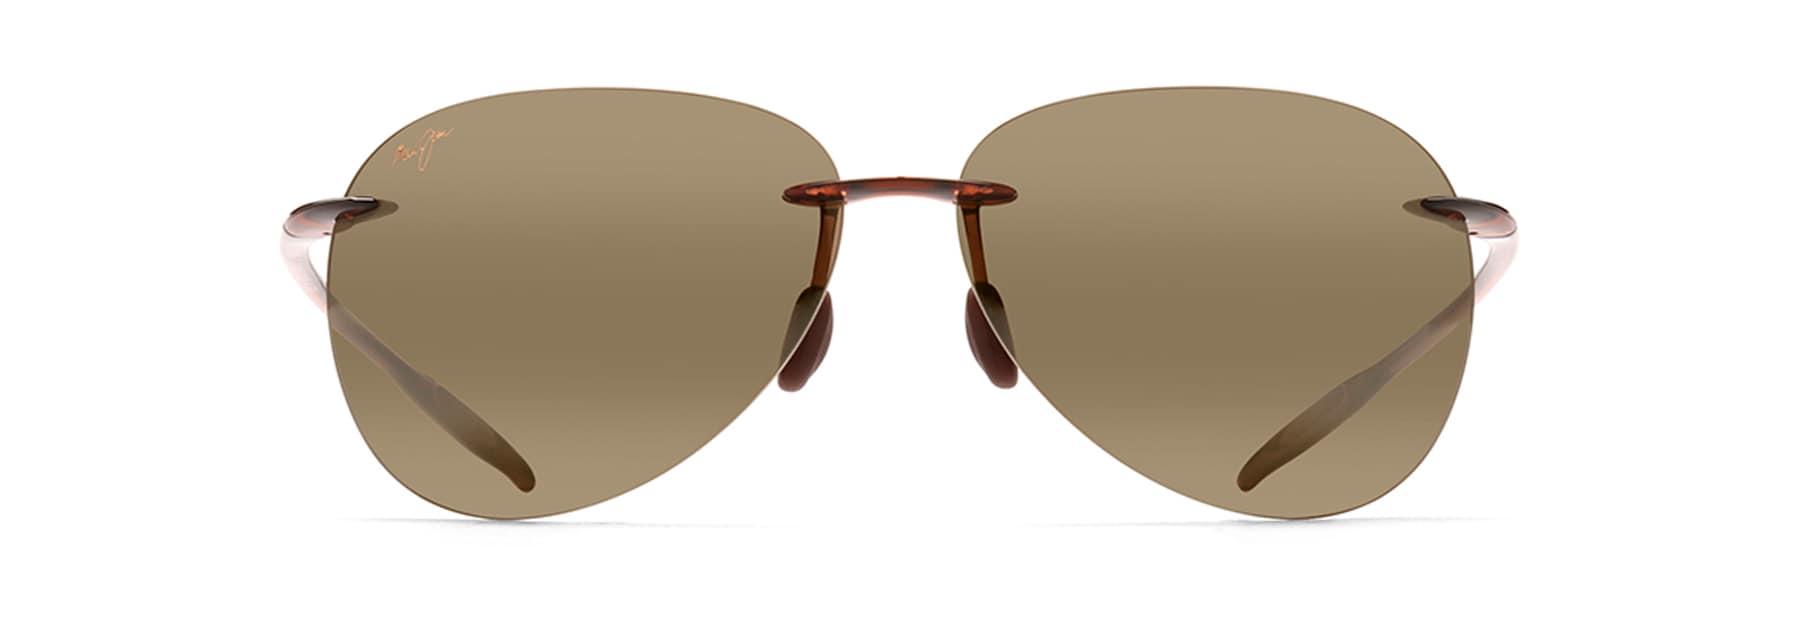 7f22639468fc42 Custom Sugar Beach Polarized Sunglasses   Maui Jim®